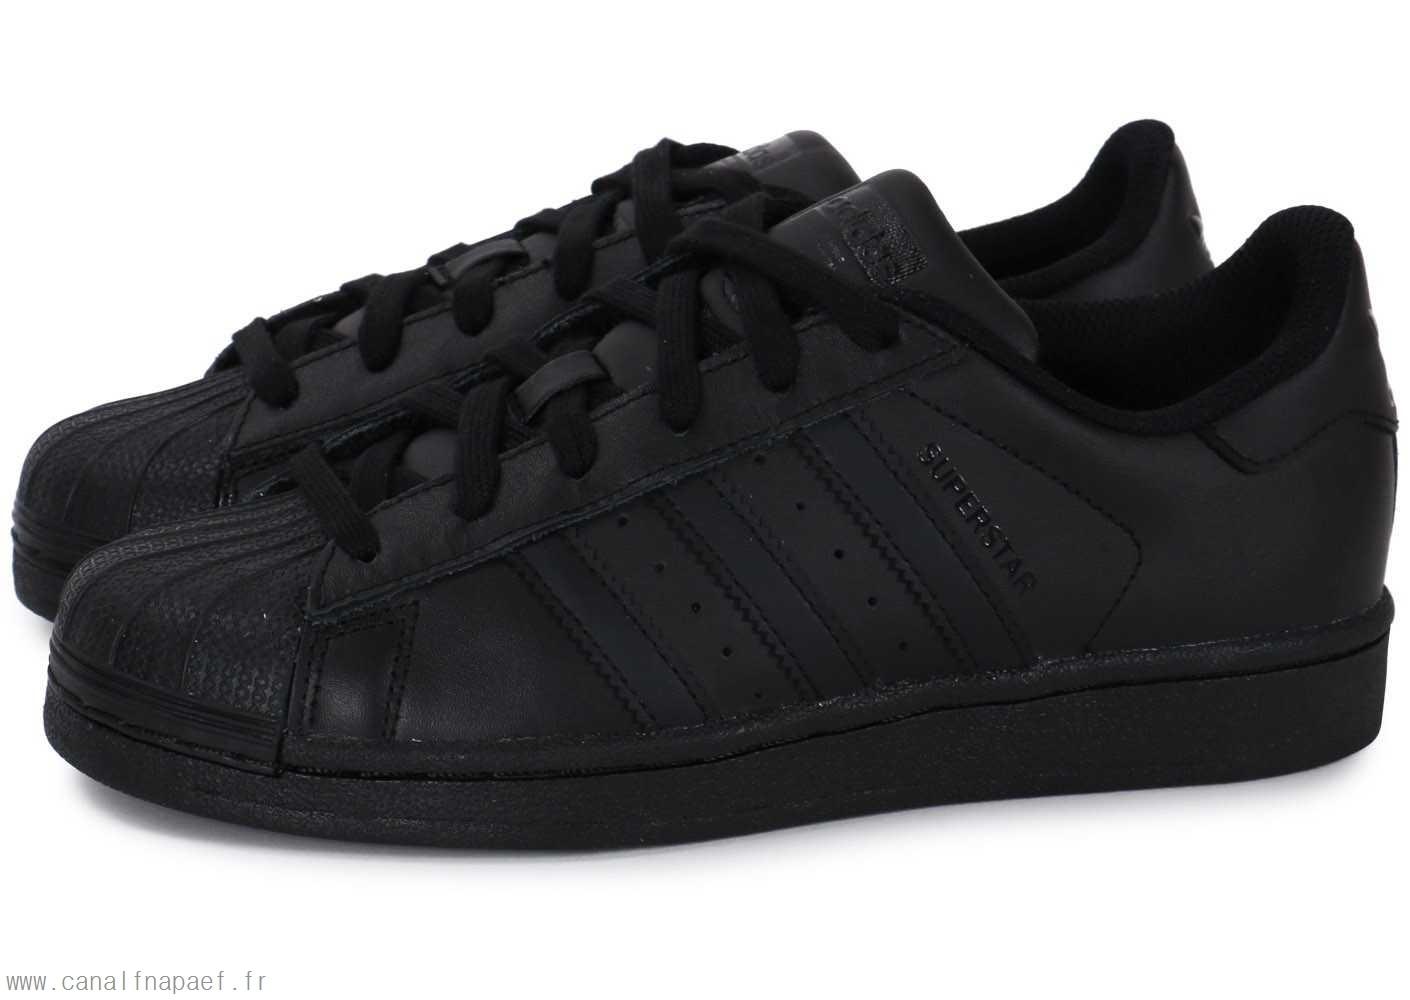 size 40 259e3 6bf29 adidas noir femme